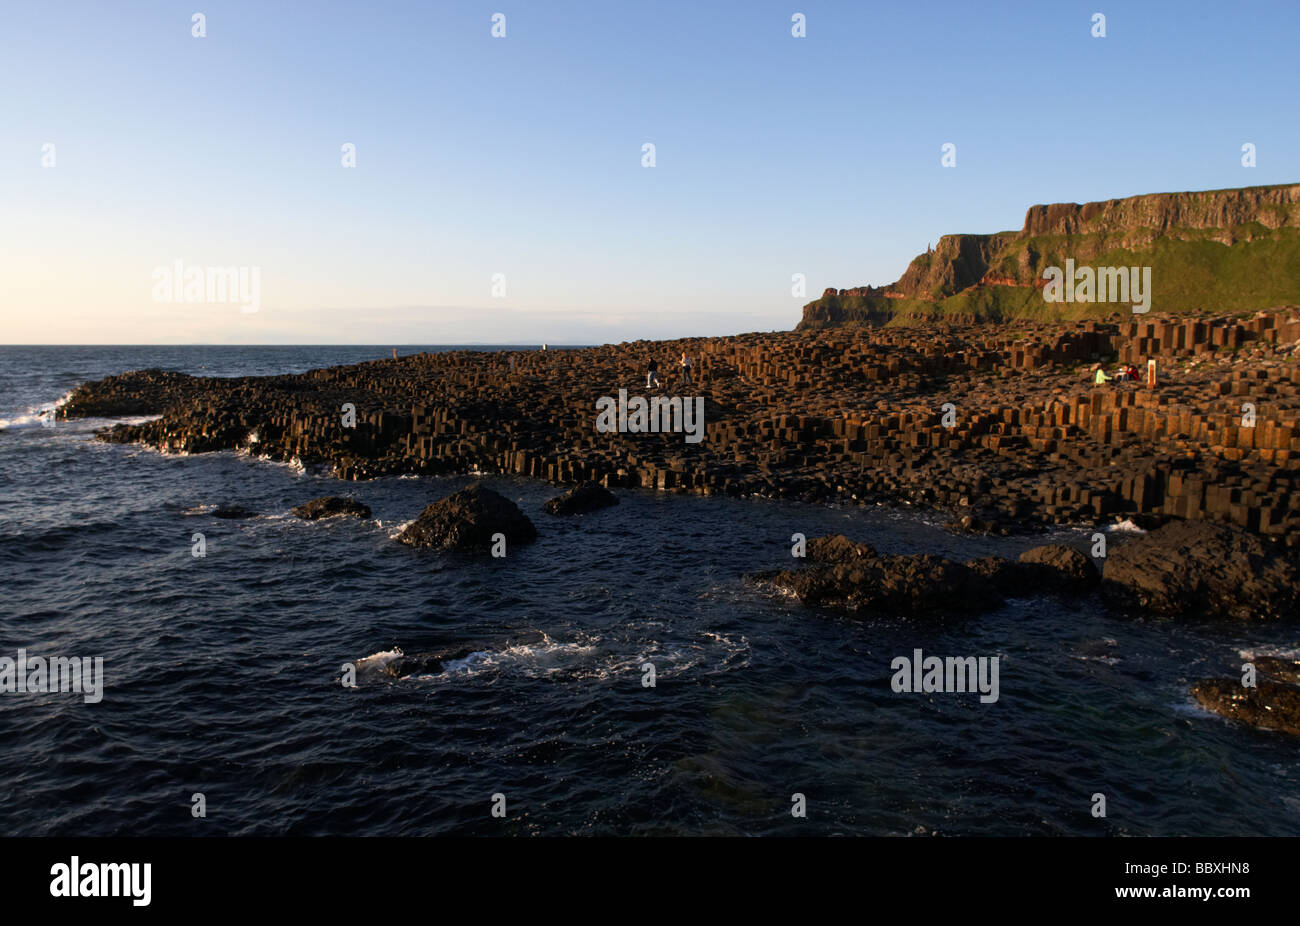 giants causeway county antrim coast northern ireland uk europe - Stock Image